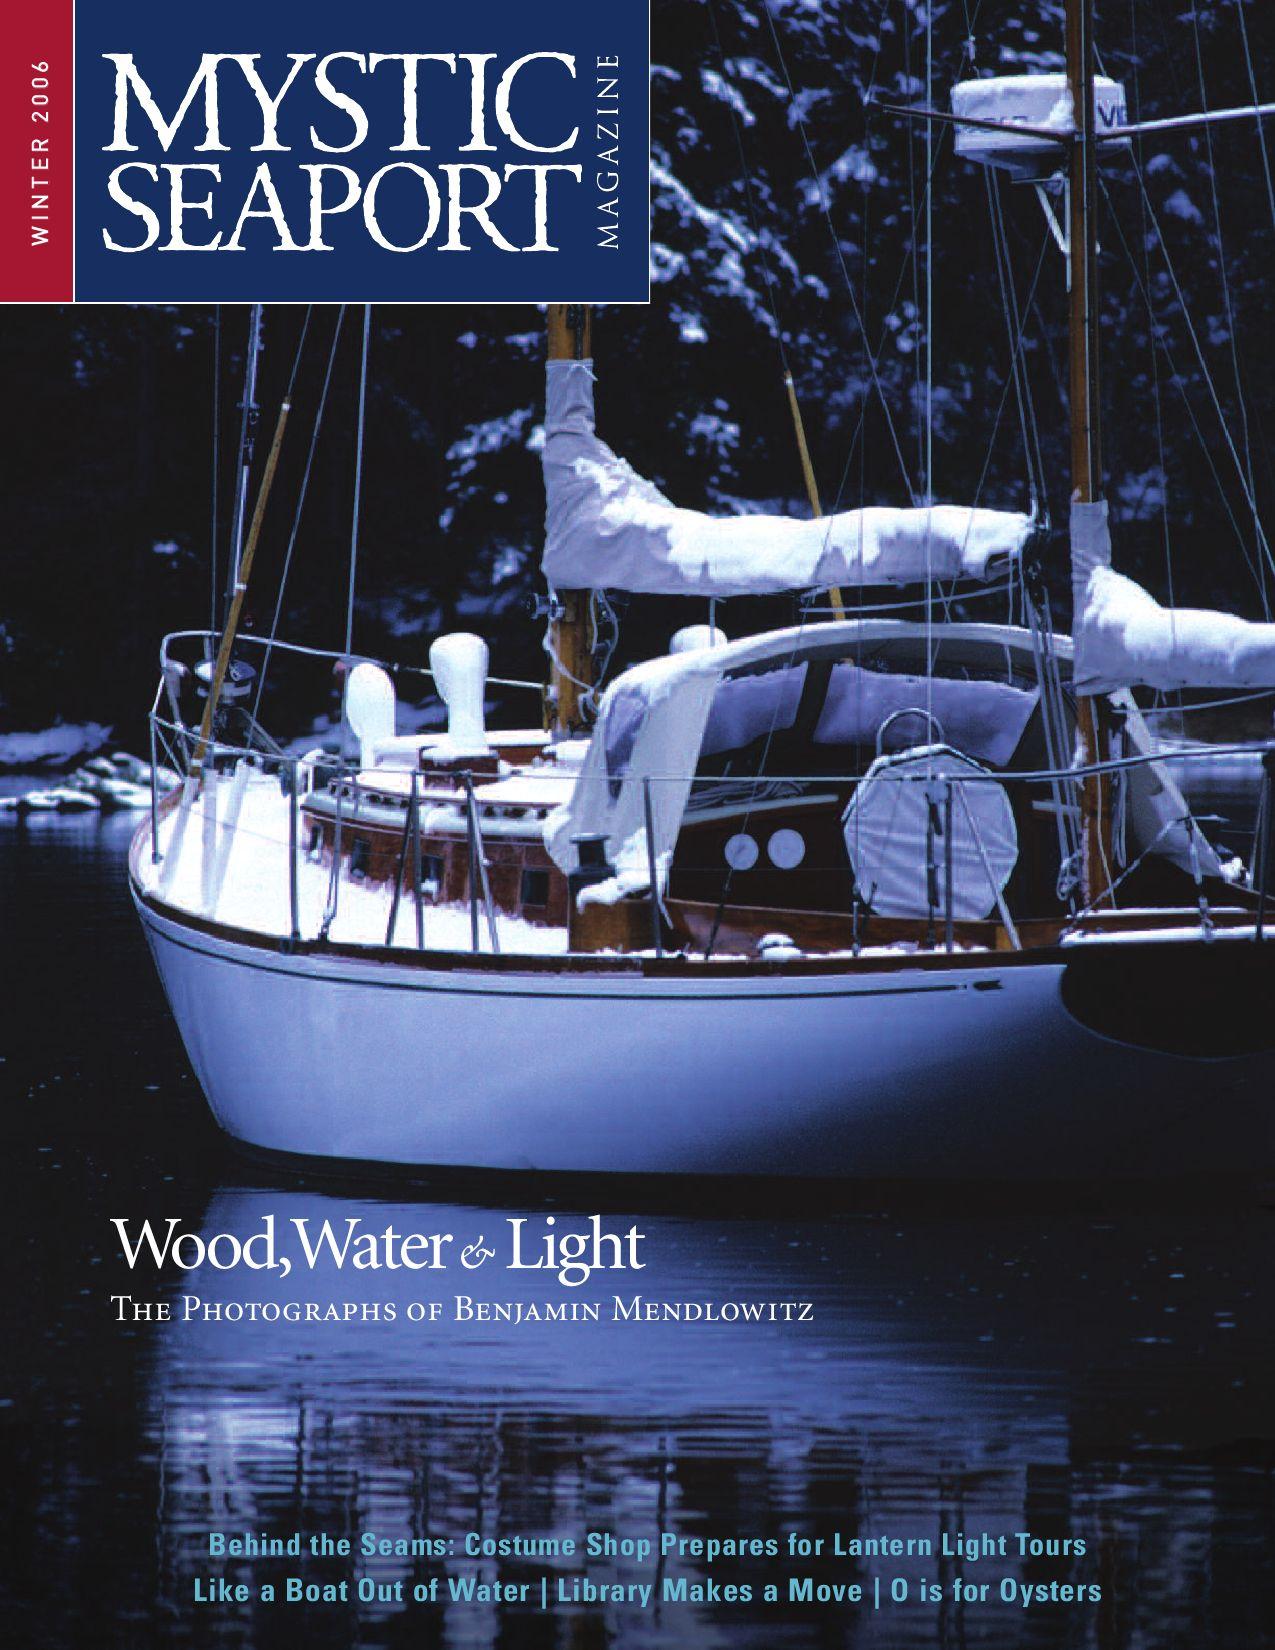 Mystic Seaport Magazine 2006 Winter By Mystic Seaport Museum   Issuu